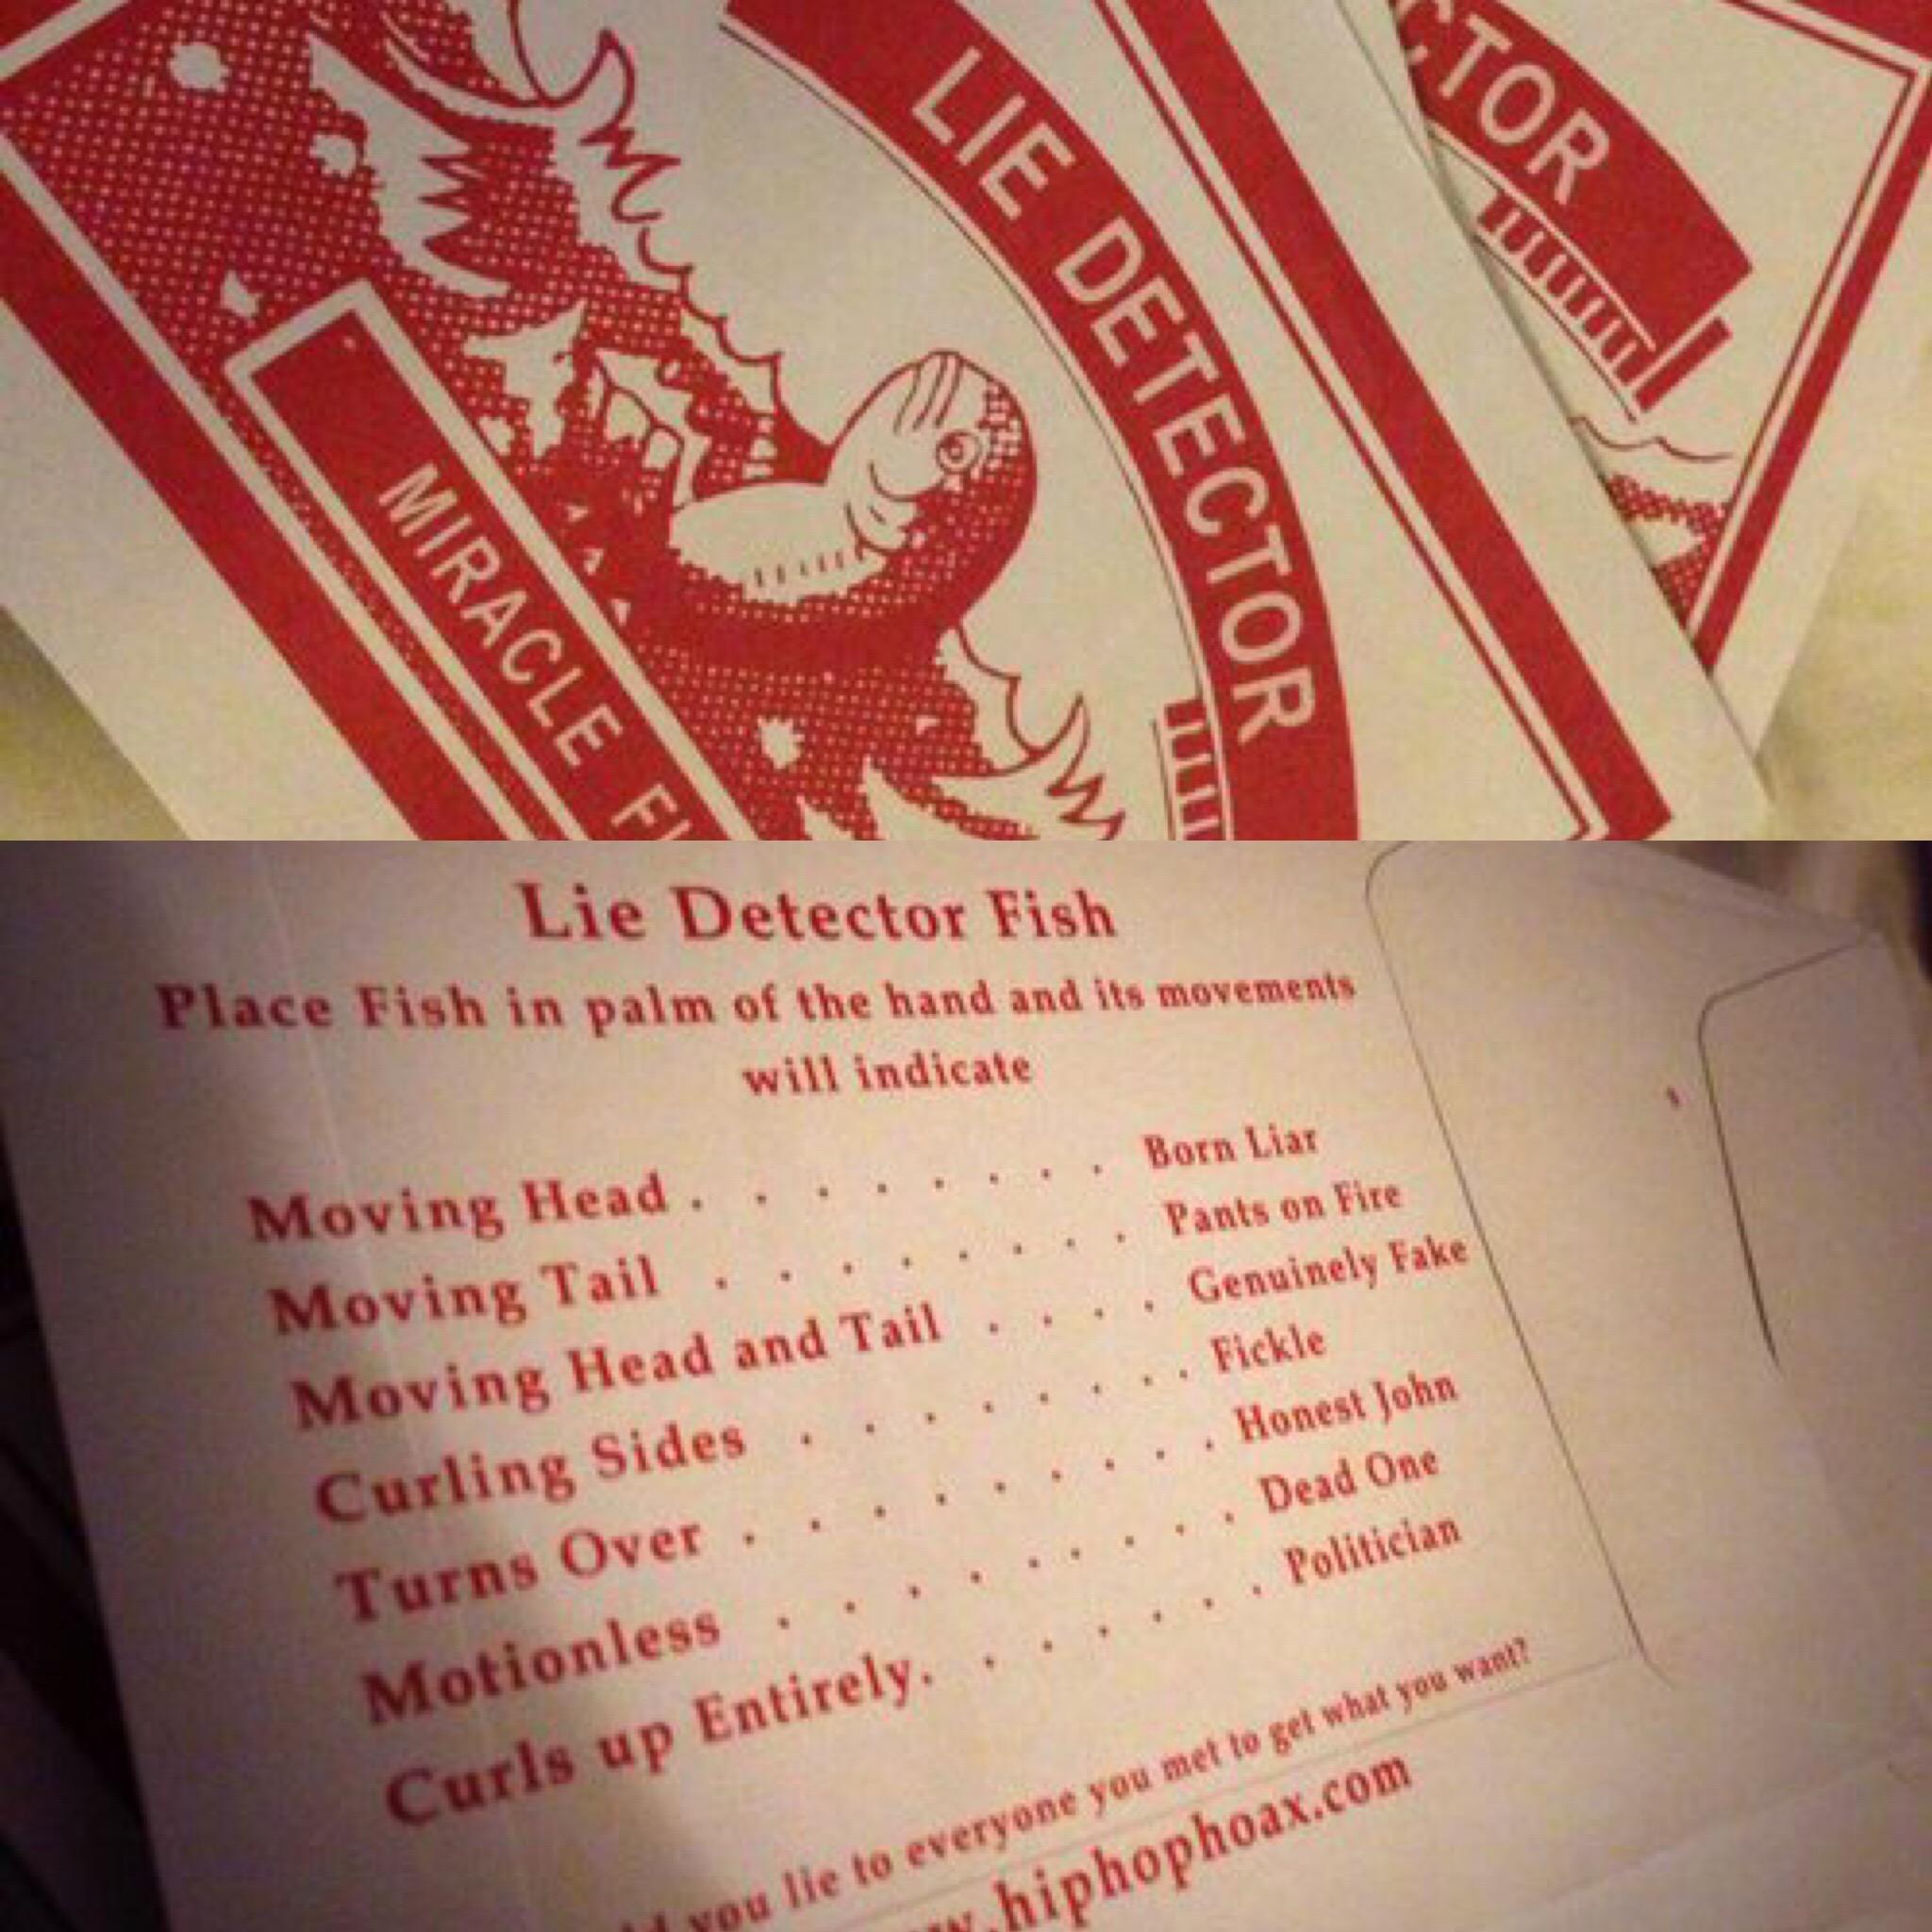 LTD edition multiple Lie Detector Fish